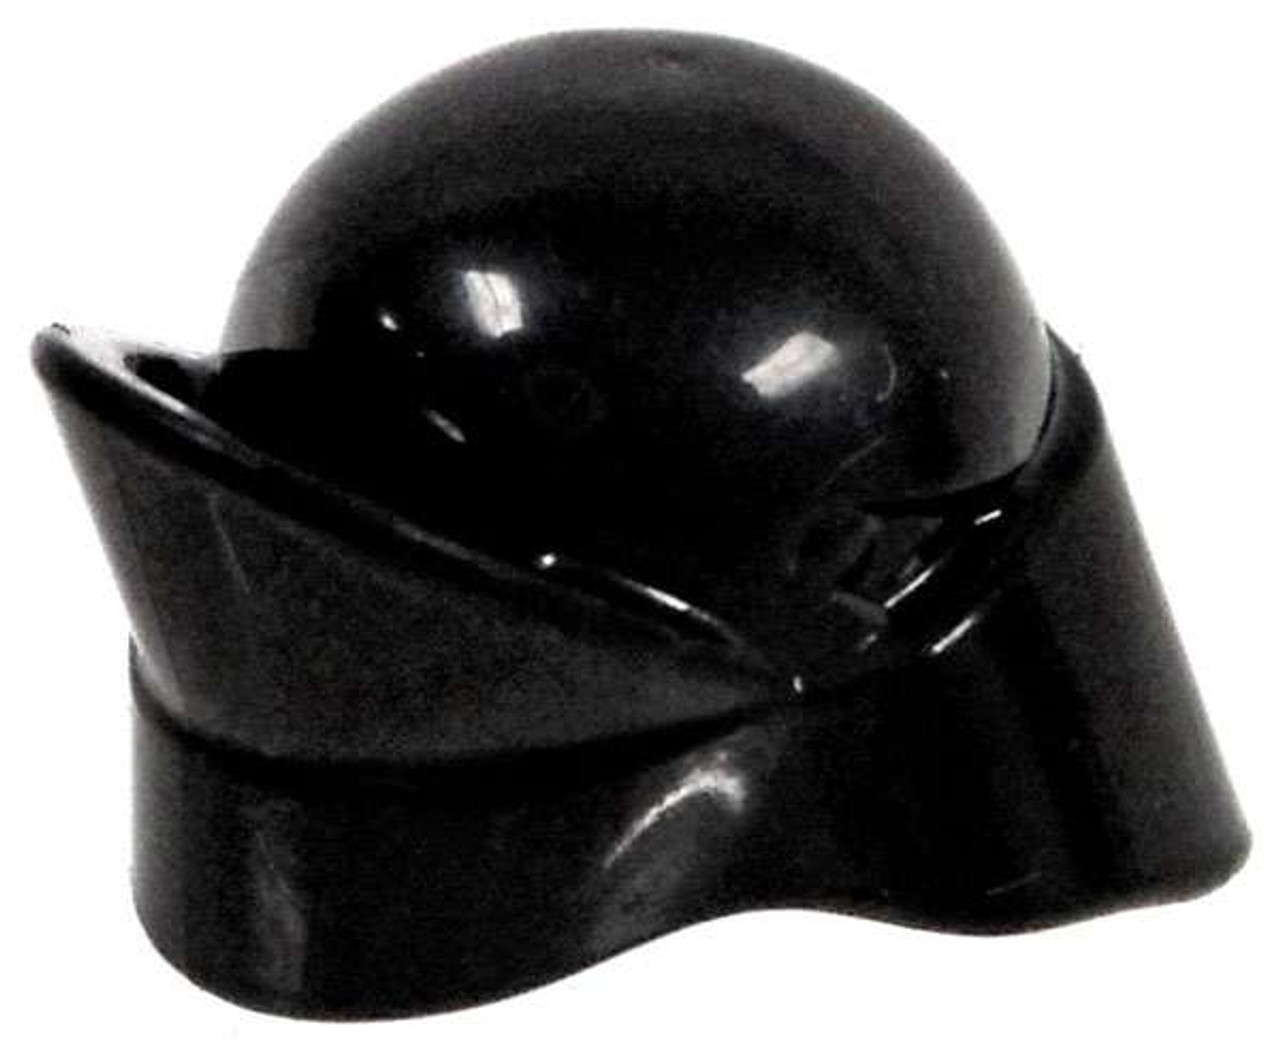 f6fd5c6d LEGO Star Wars Loose First Order Crew Helmet Loose - ToyWiz